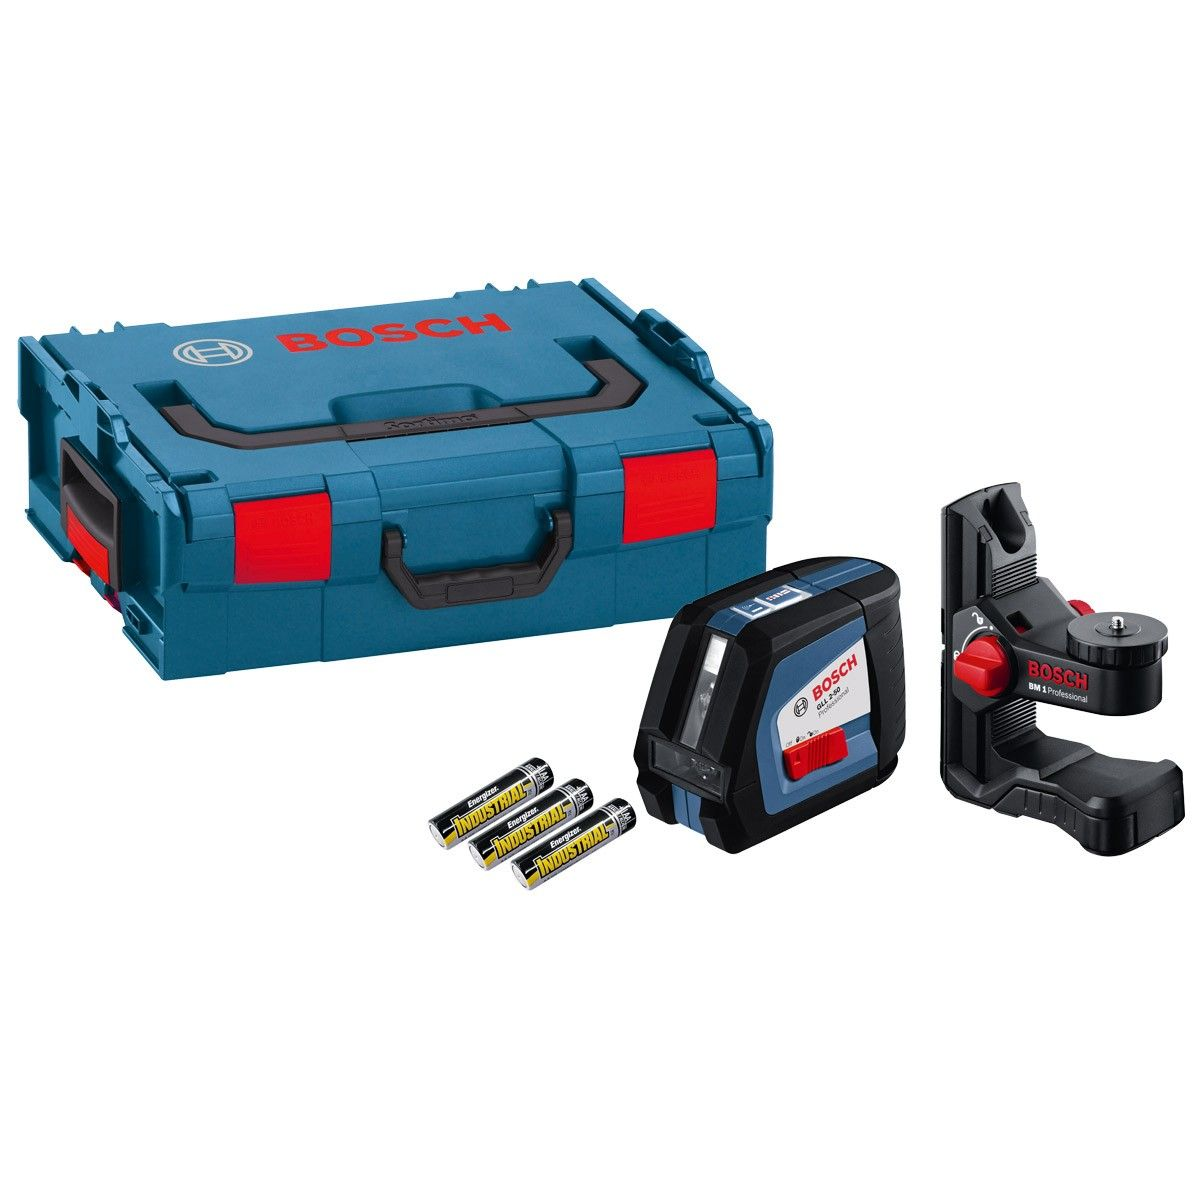 Bosch Cross Line Laser Gll 2 50 Inc Bm1 Plus Bracket L Boxx